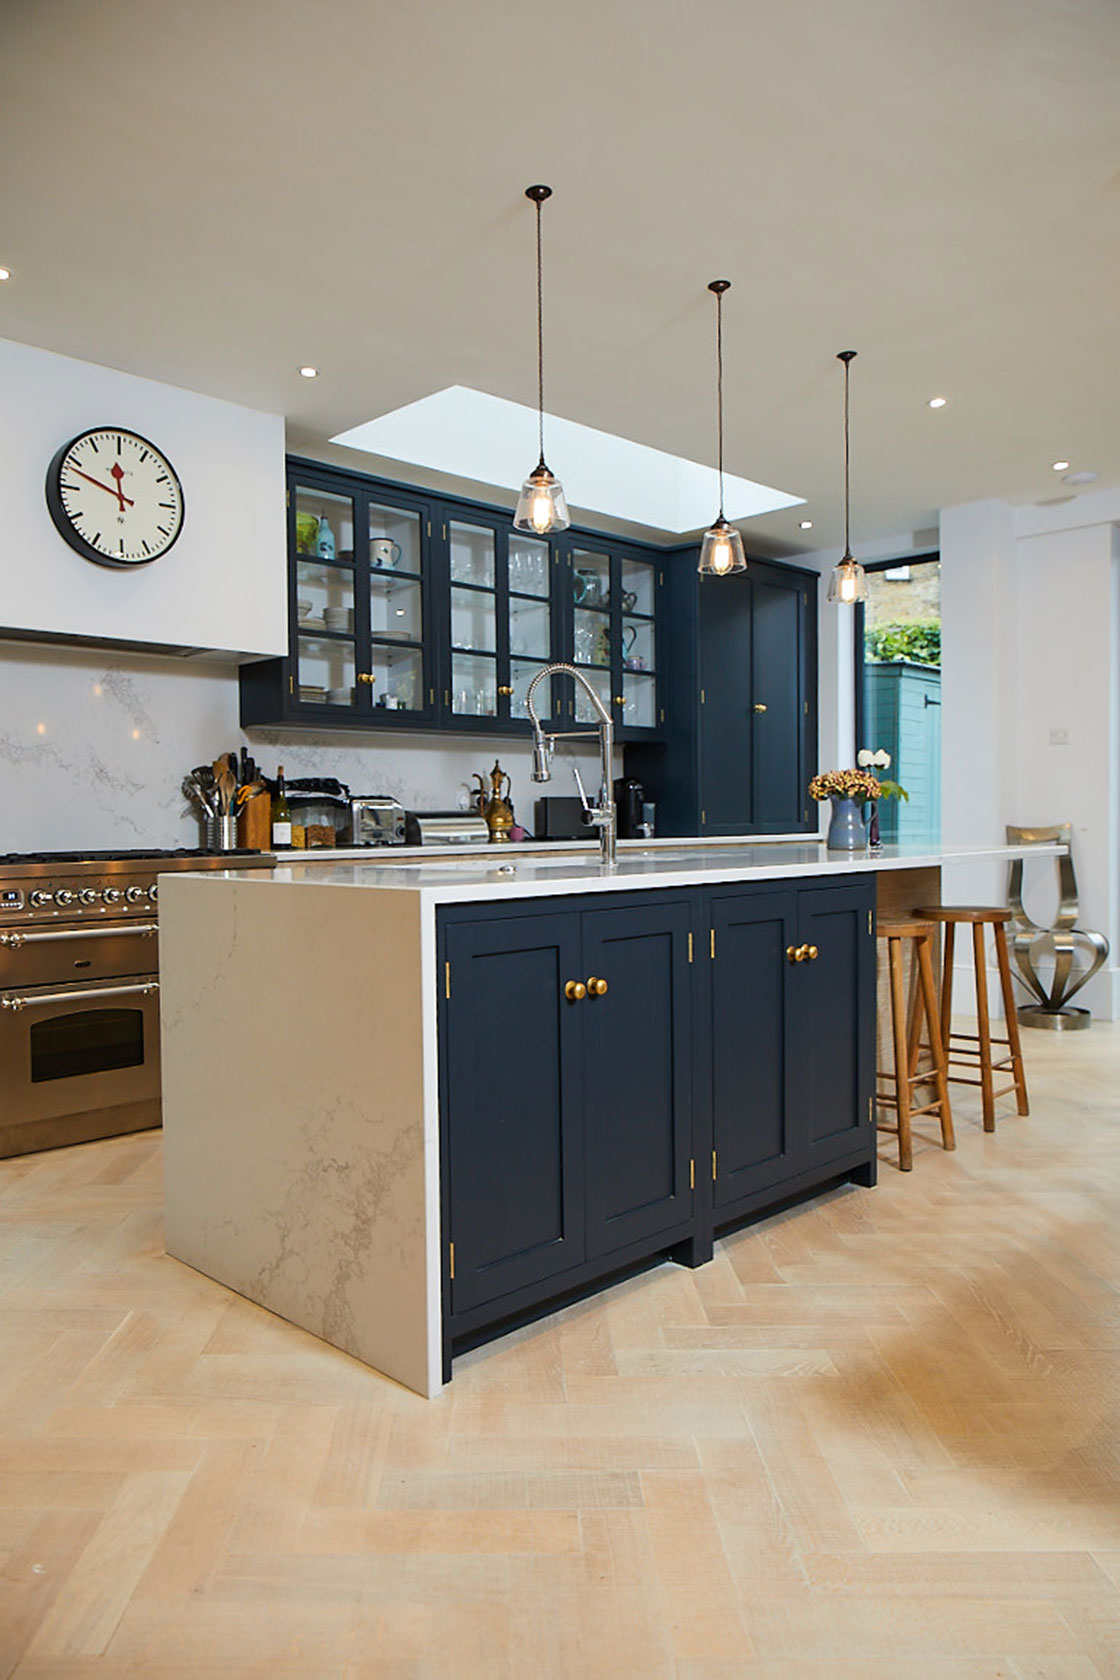 Dark blue double doors on kitchen island with white caesartone worktop and parquet wood floor